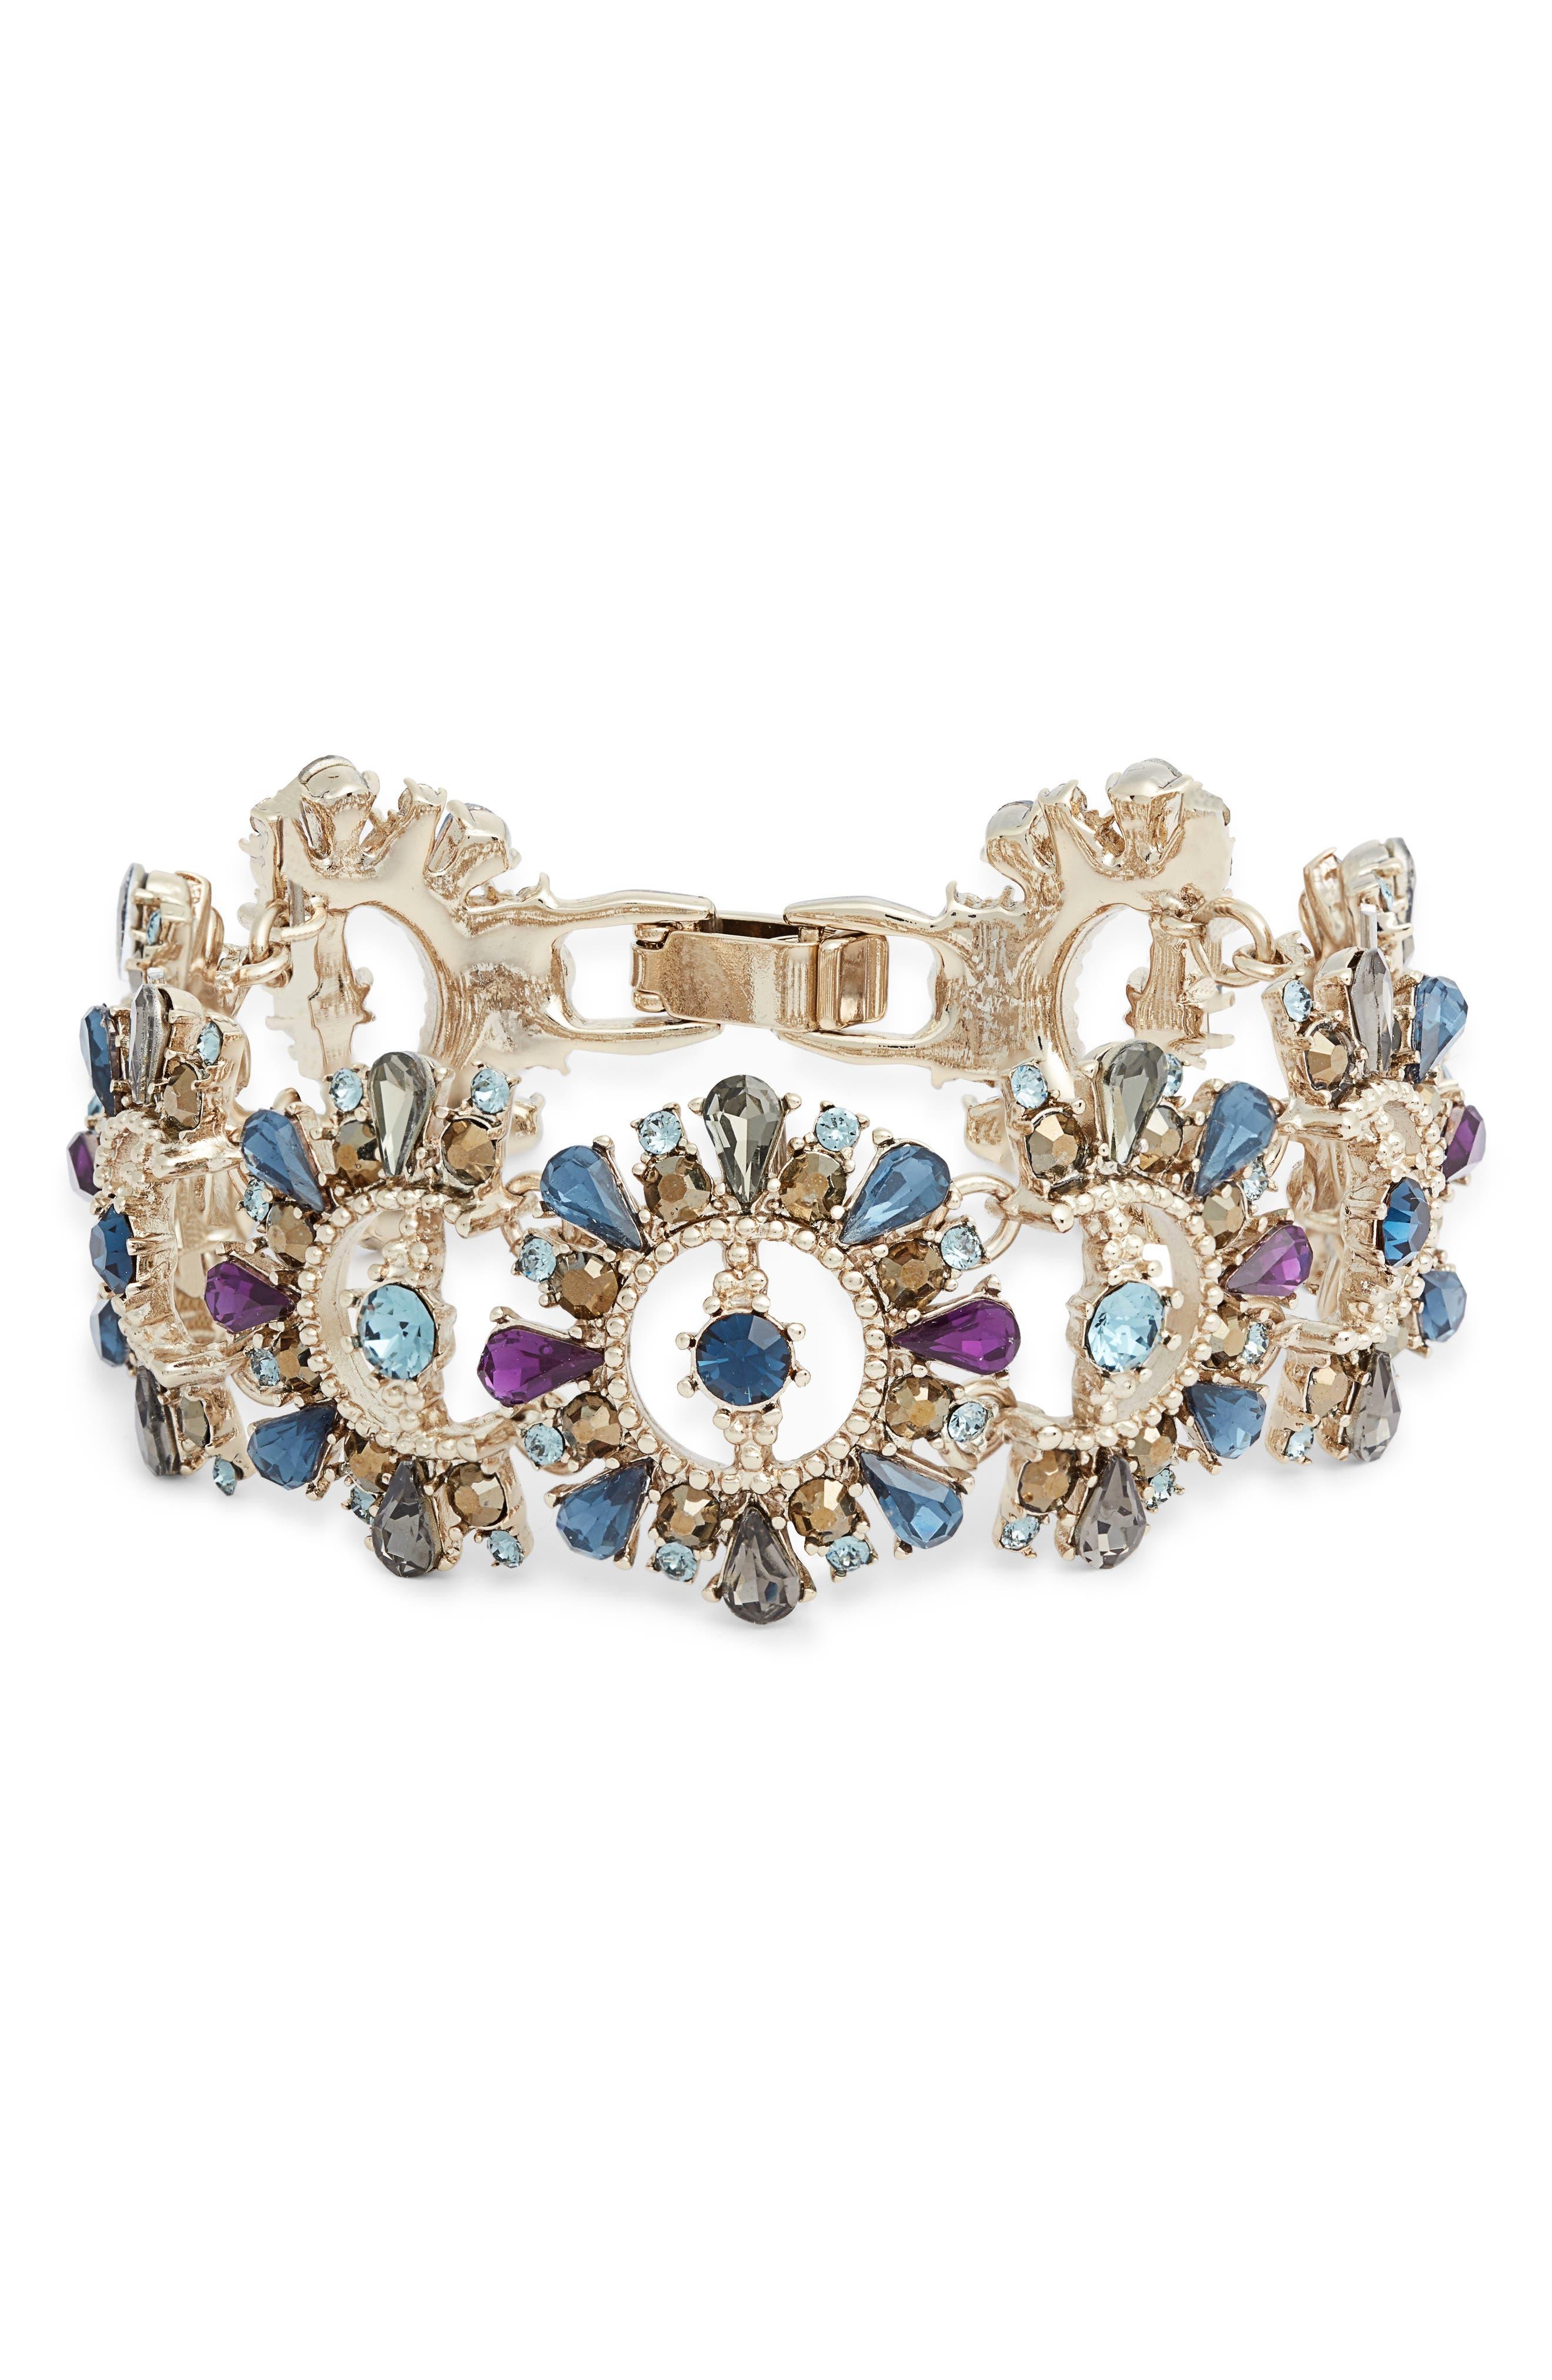 MARCHESA, Drama Crystal Bracelet, Main thumbnail 1, color, BLUE MULTI/ GOLD